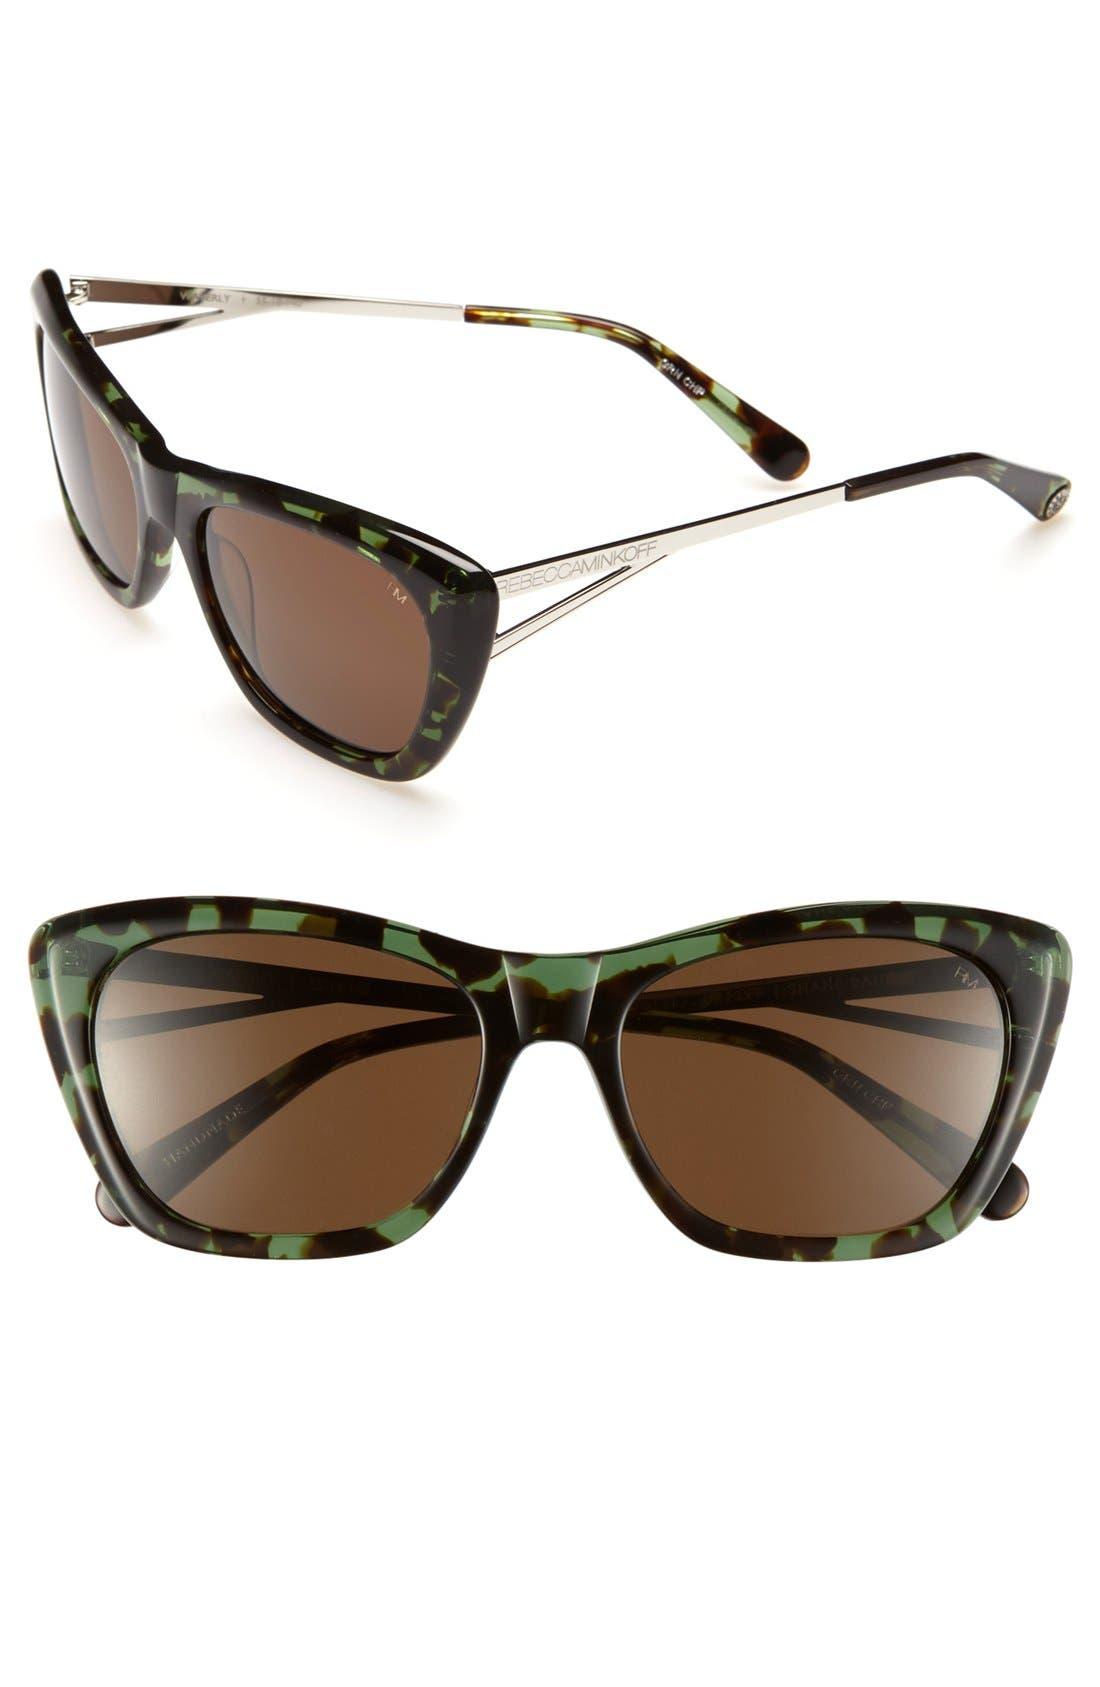 Main Image - Rebecca Minkoff 'Waverly' 55mm Sunglasses